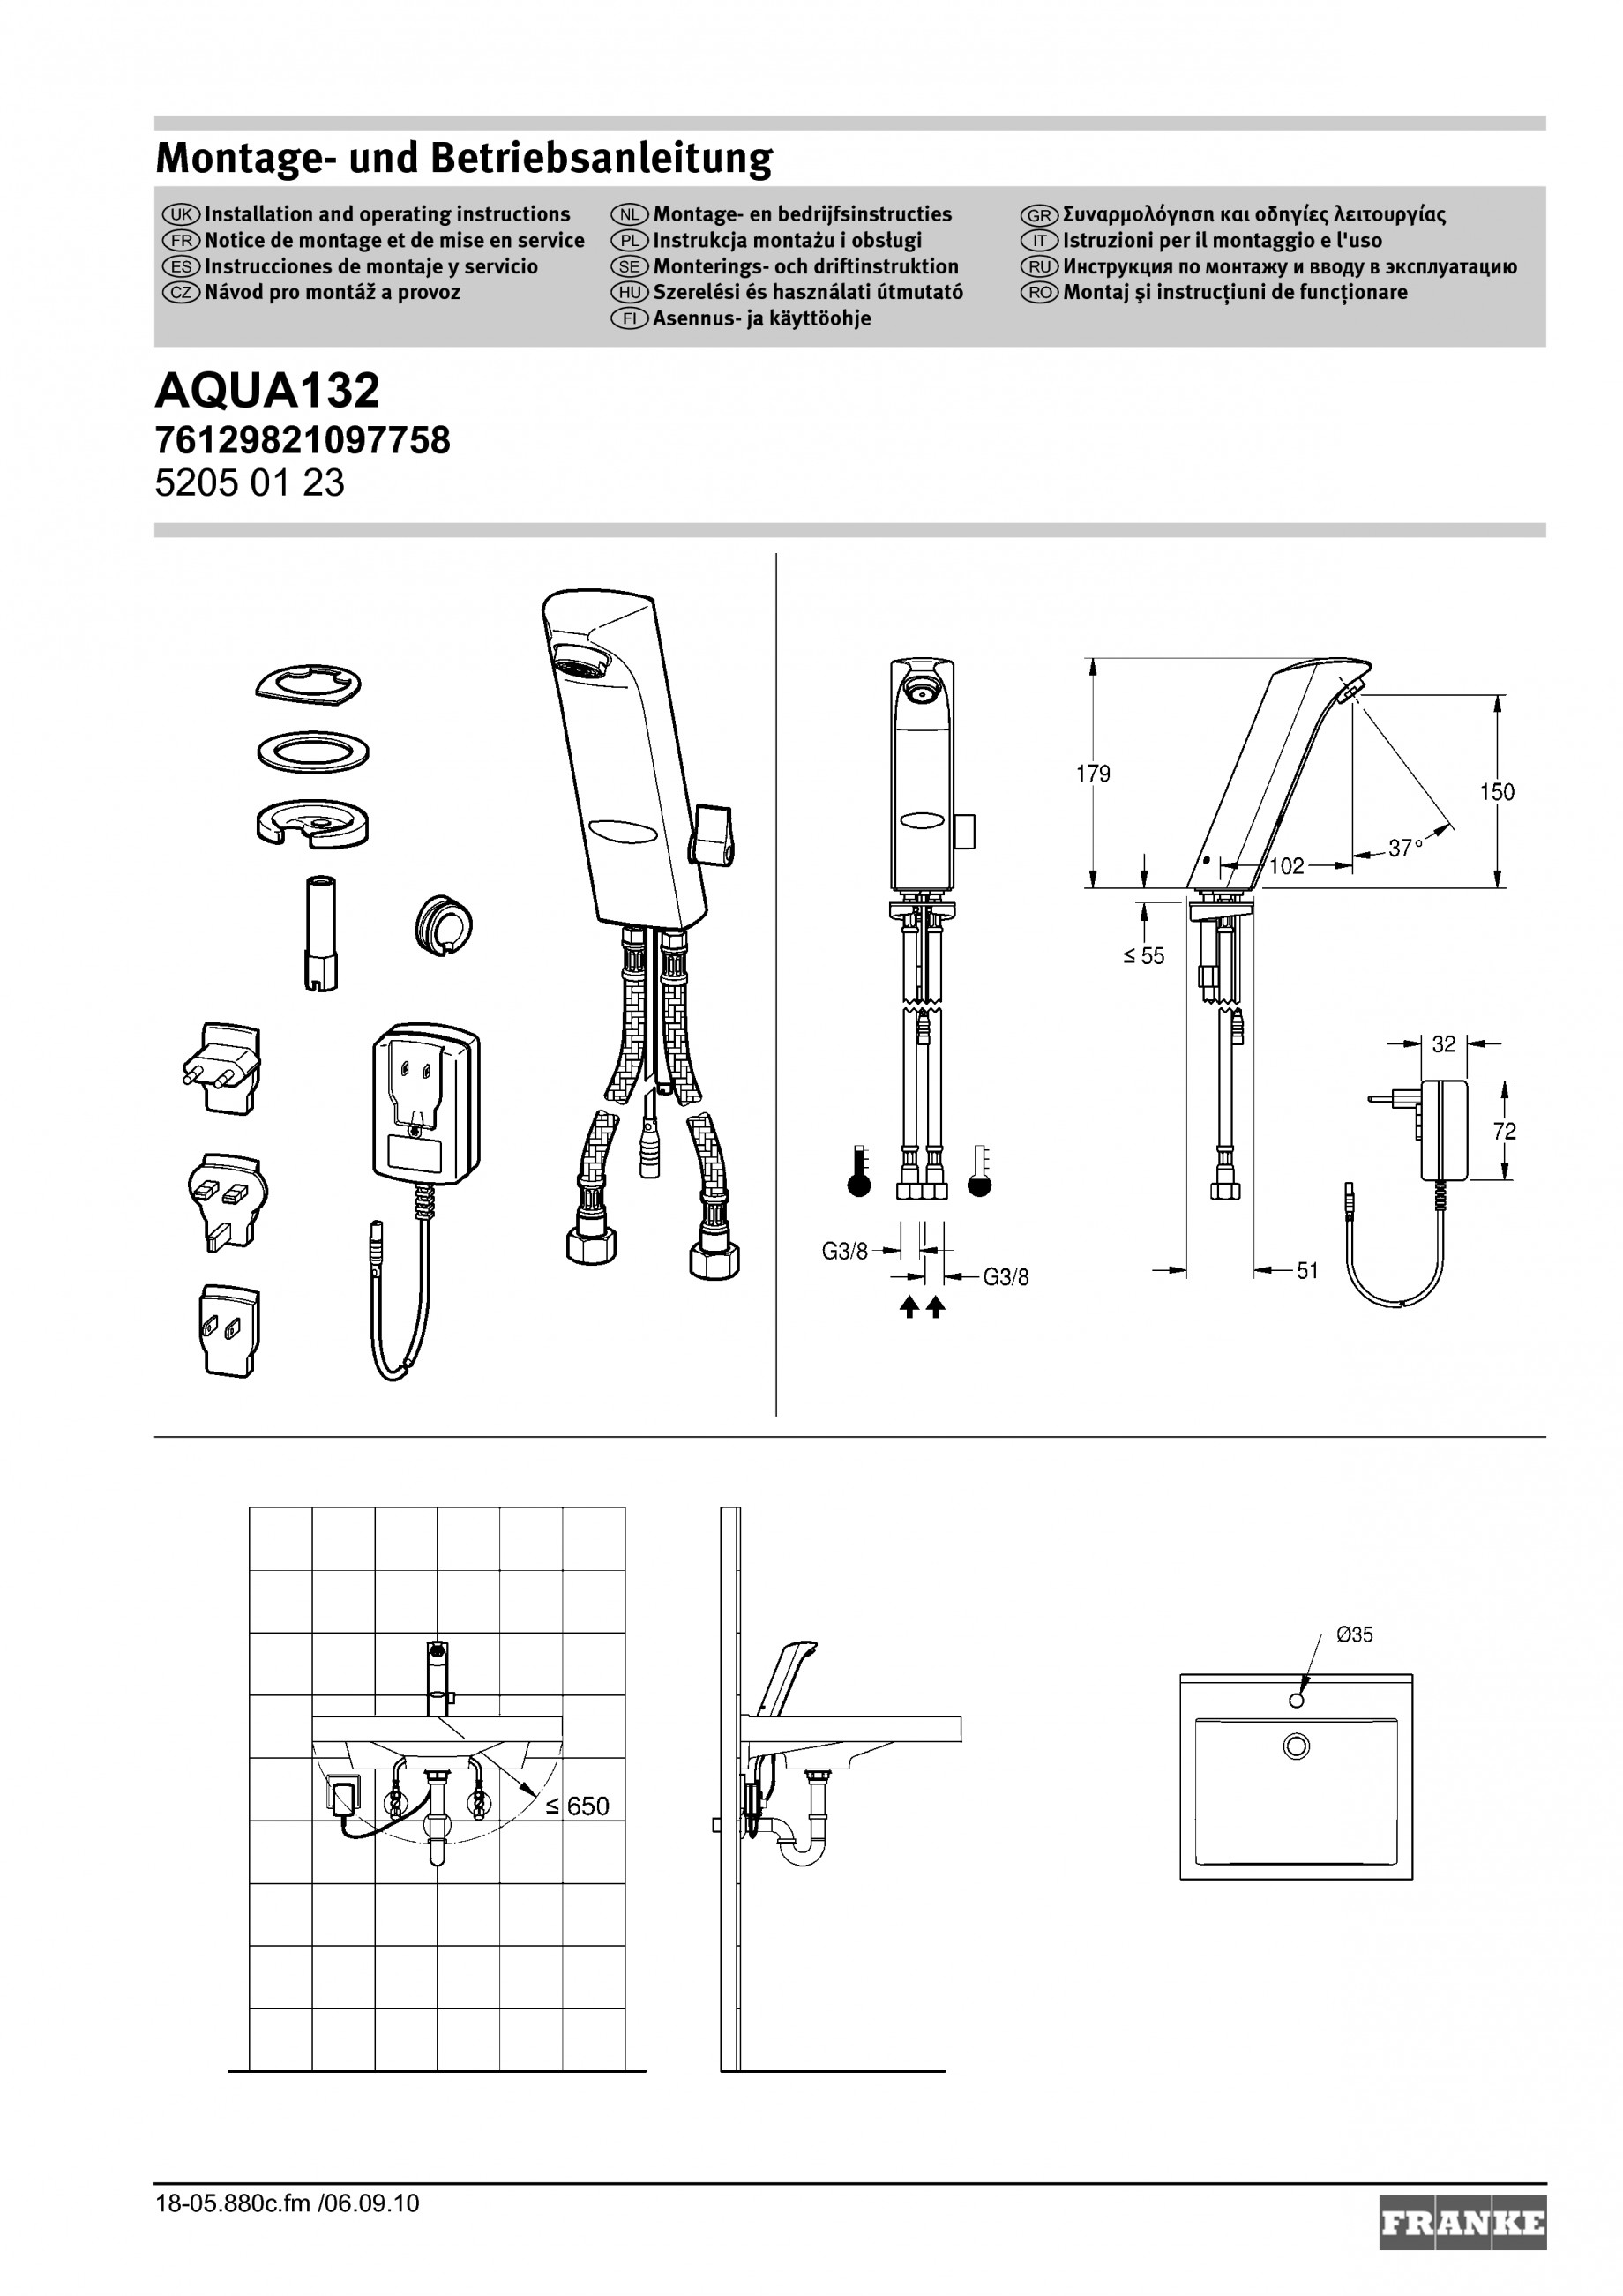 instructiuni montaj utilizare baterii baie electronice protronic s aqua132 franke baterii baie. Black Bedroom Furniture Sets. Home Design Ideas